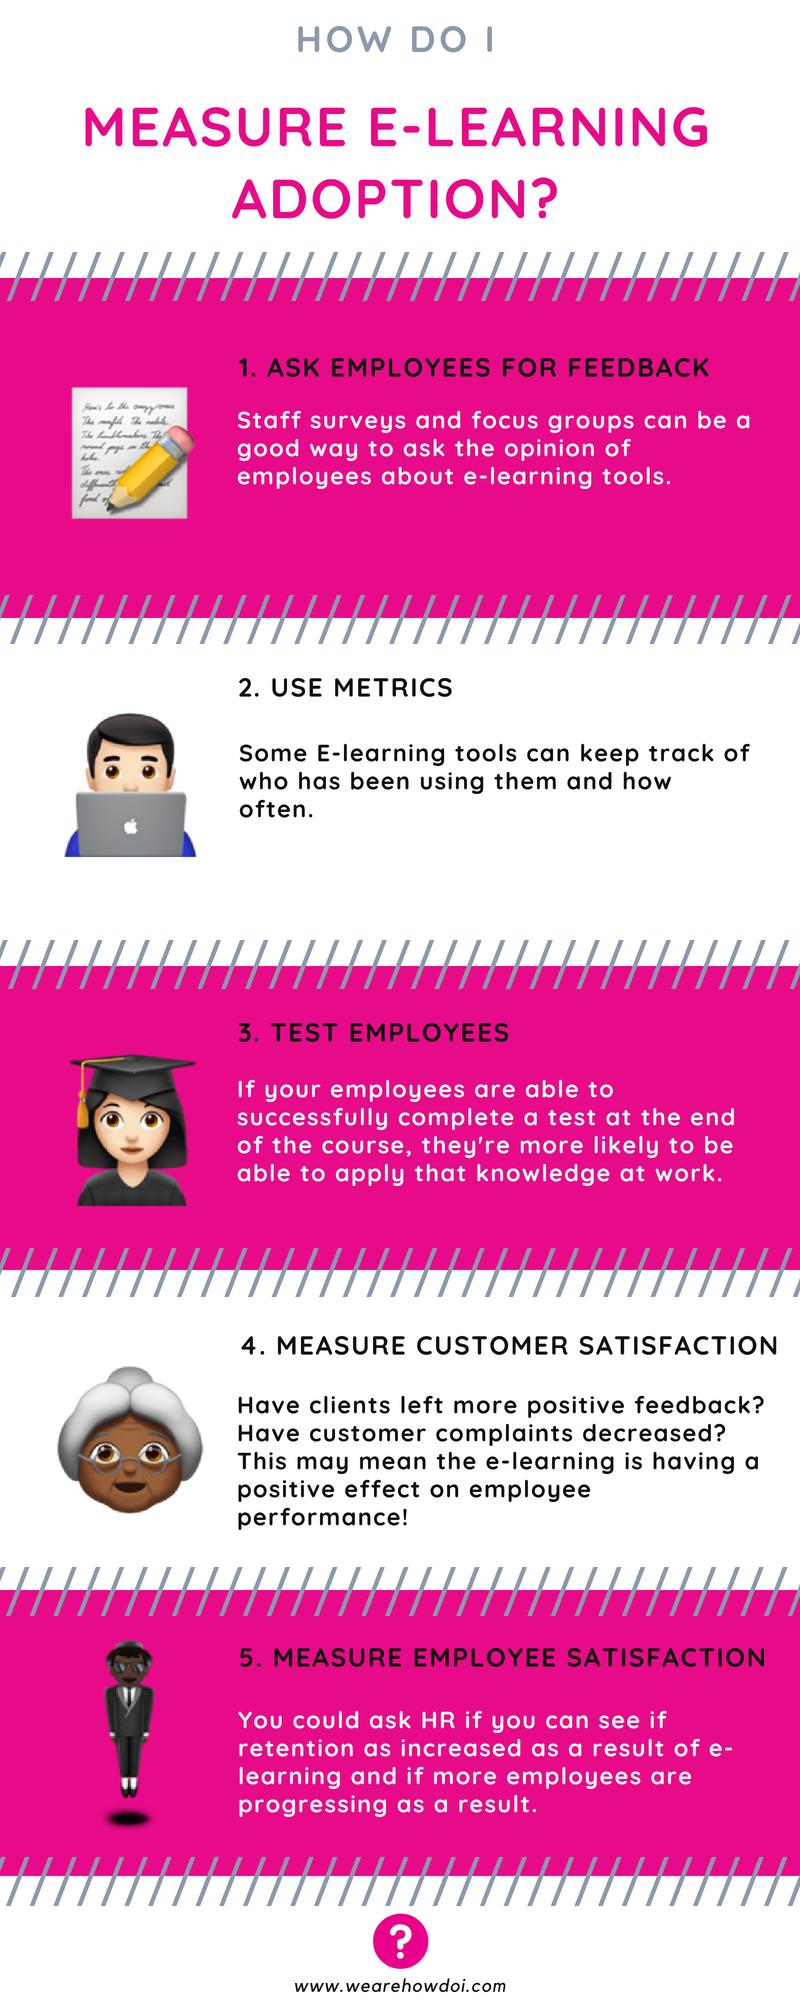 How do I measure e-learning adoption.png